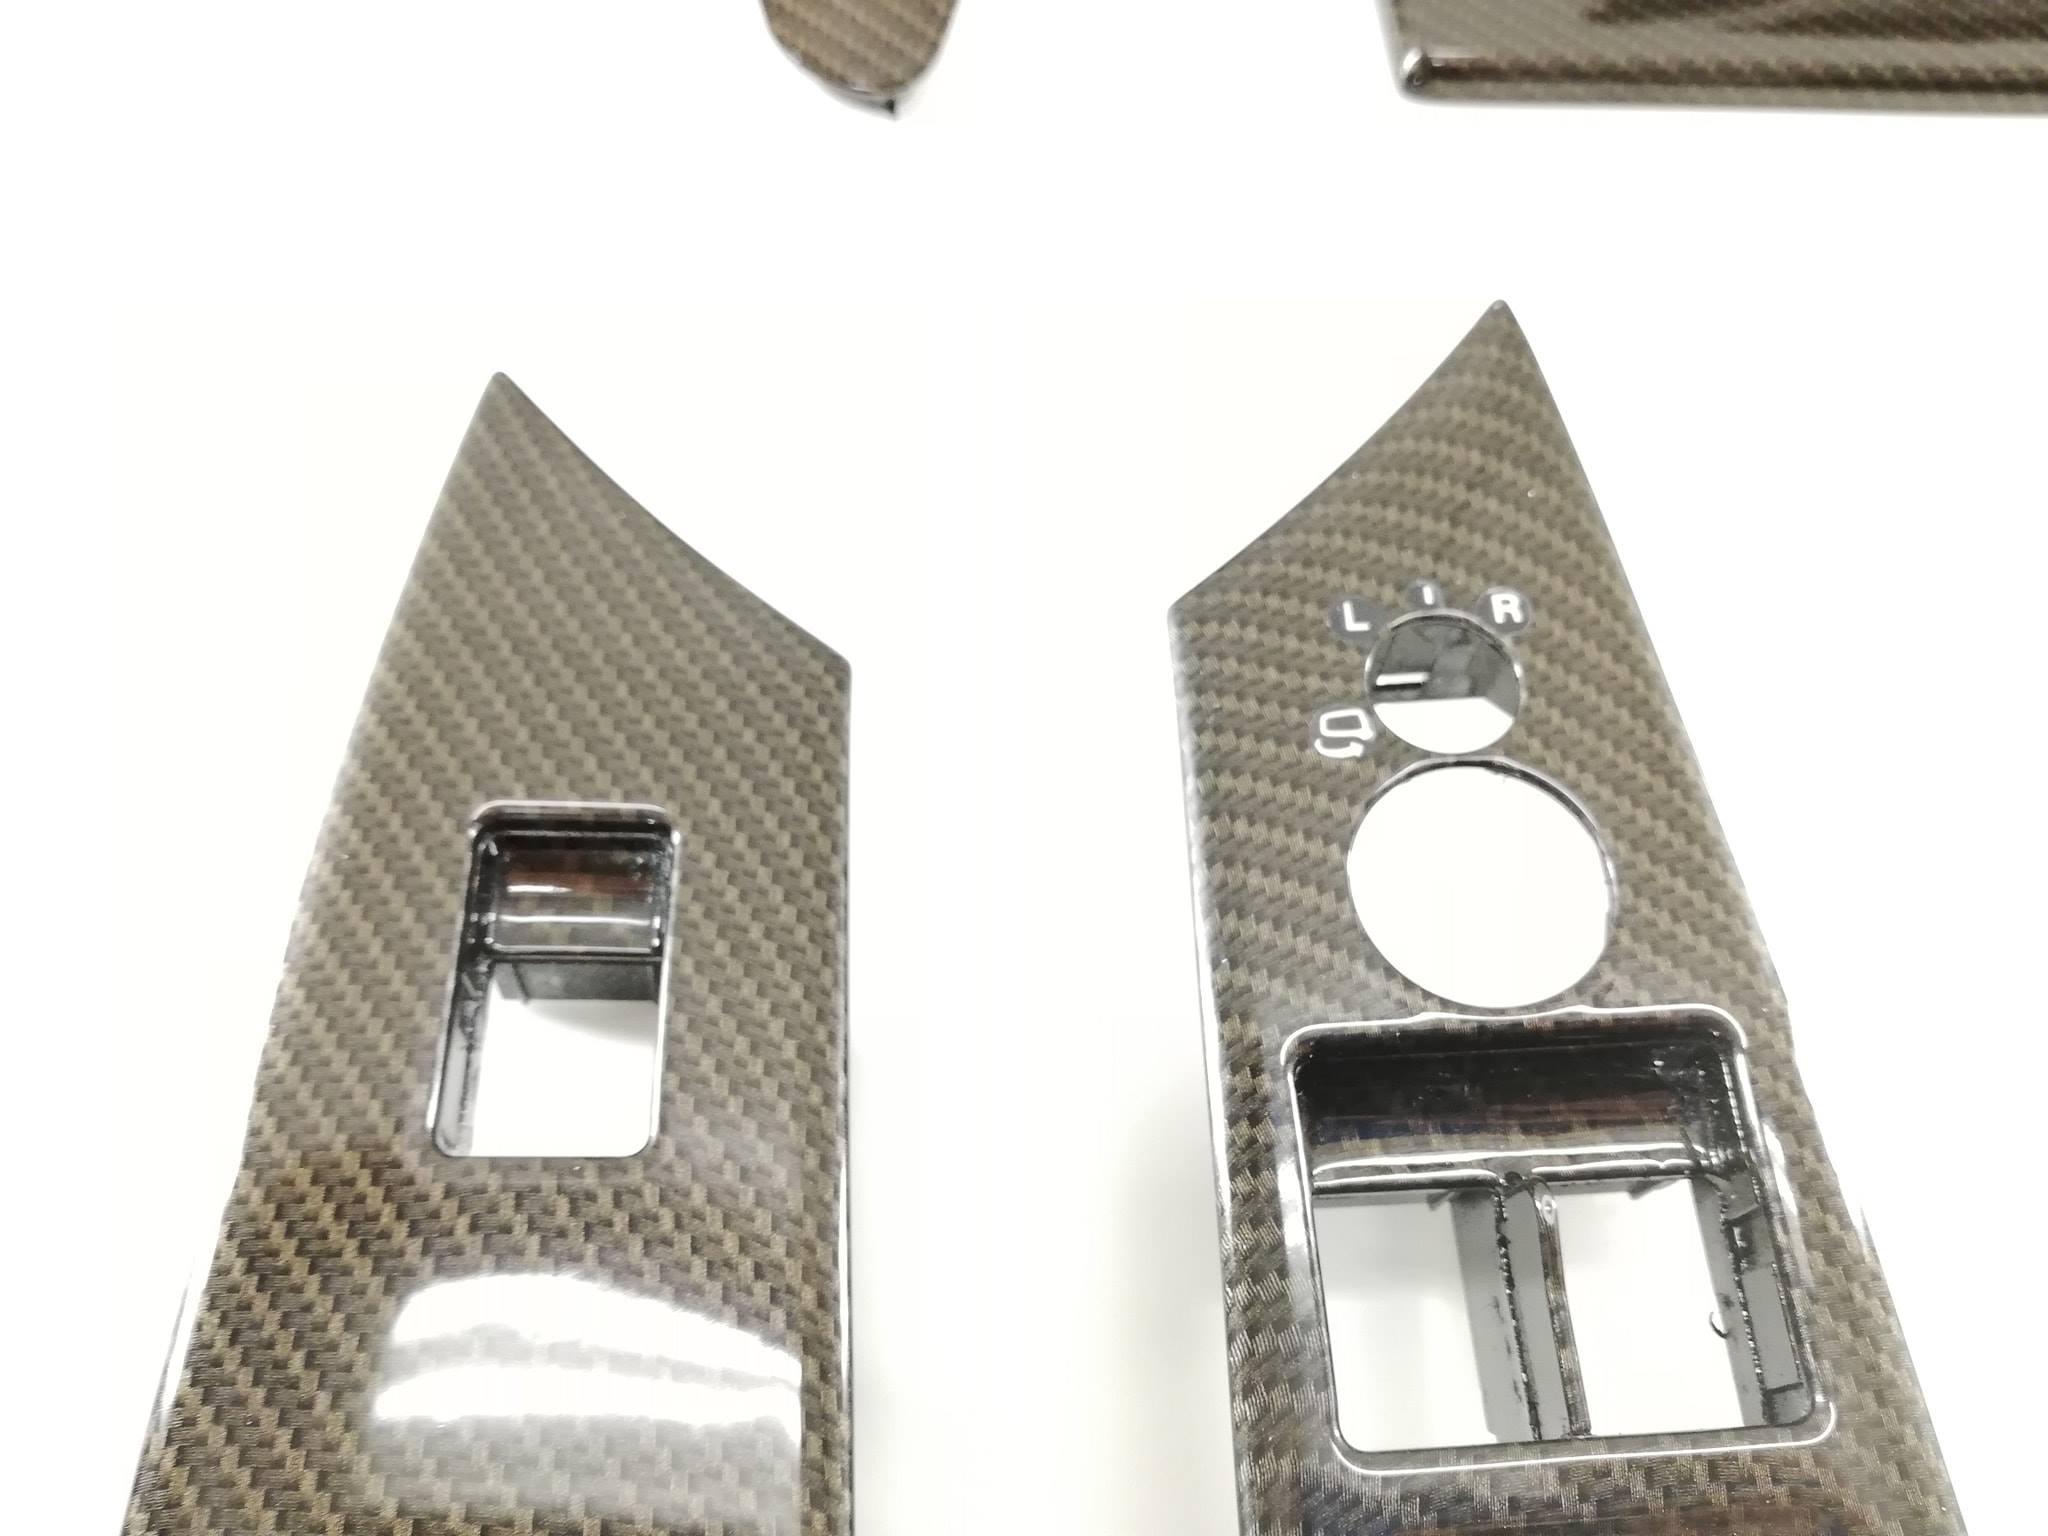 audi s8 interieur carbon hydrodip www.fsb-dip.nl